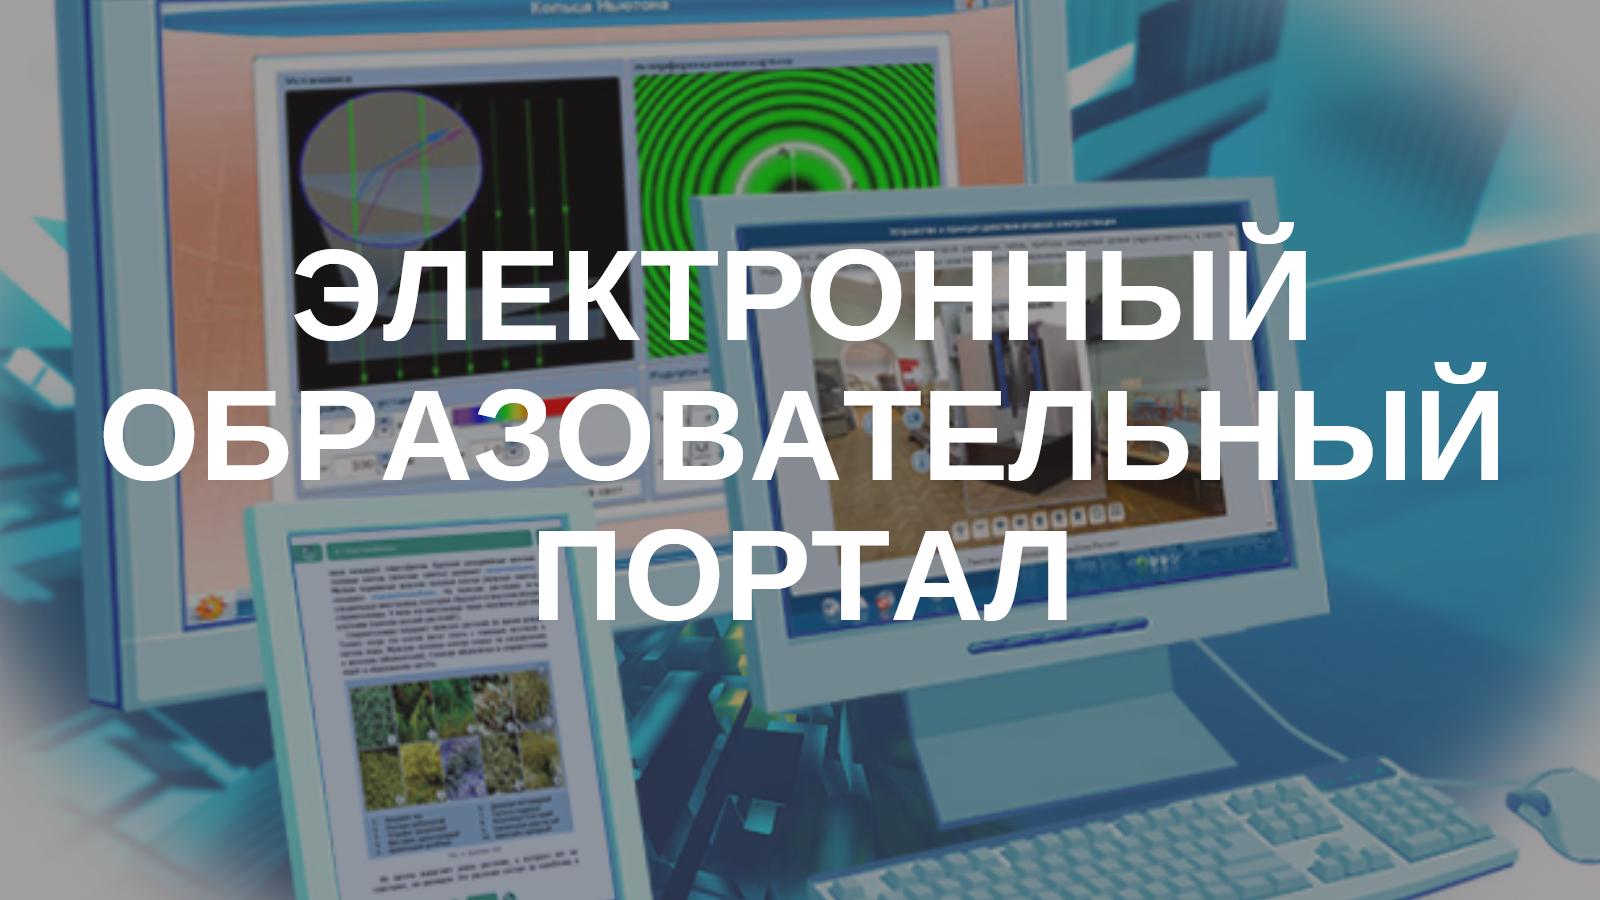 Воронежский филиал АСМС